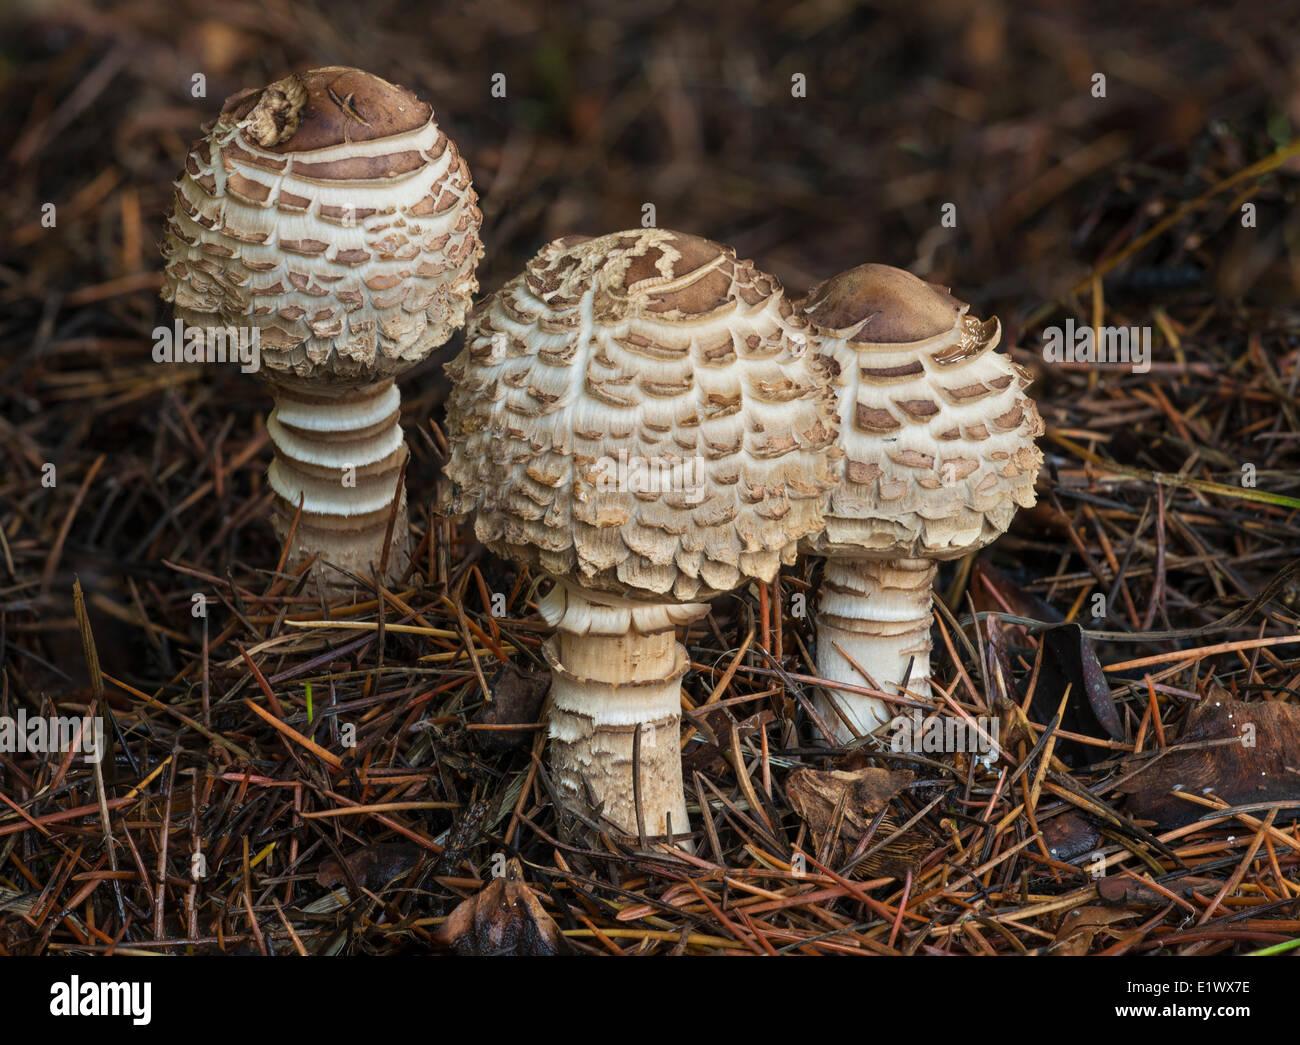 Shaggy parasol, Lepiota rhacodes growing on the forest floor amongst pine needles, East Sooke Park, Sooke BC - Stock Image